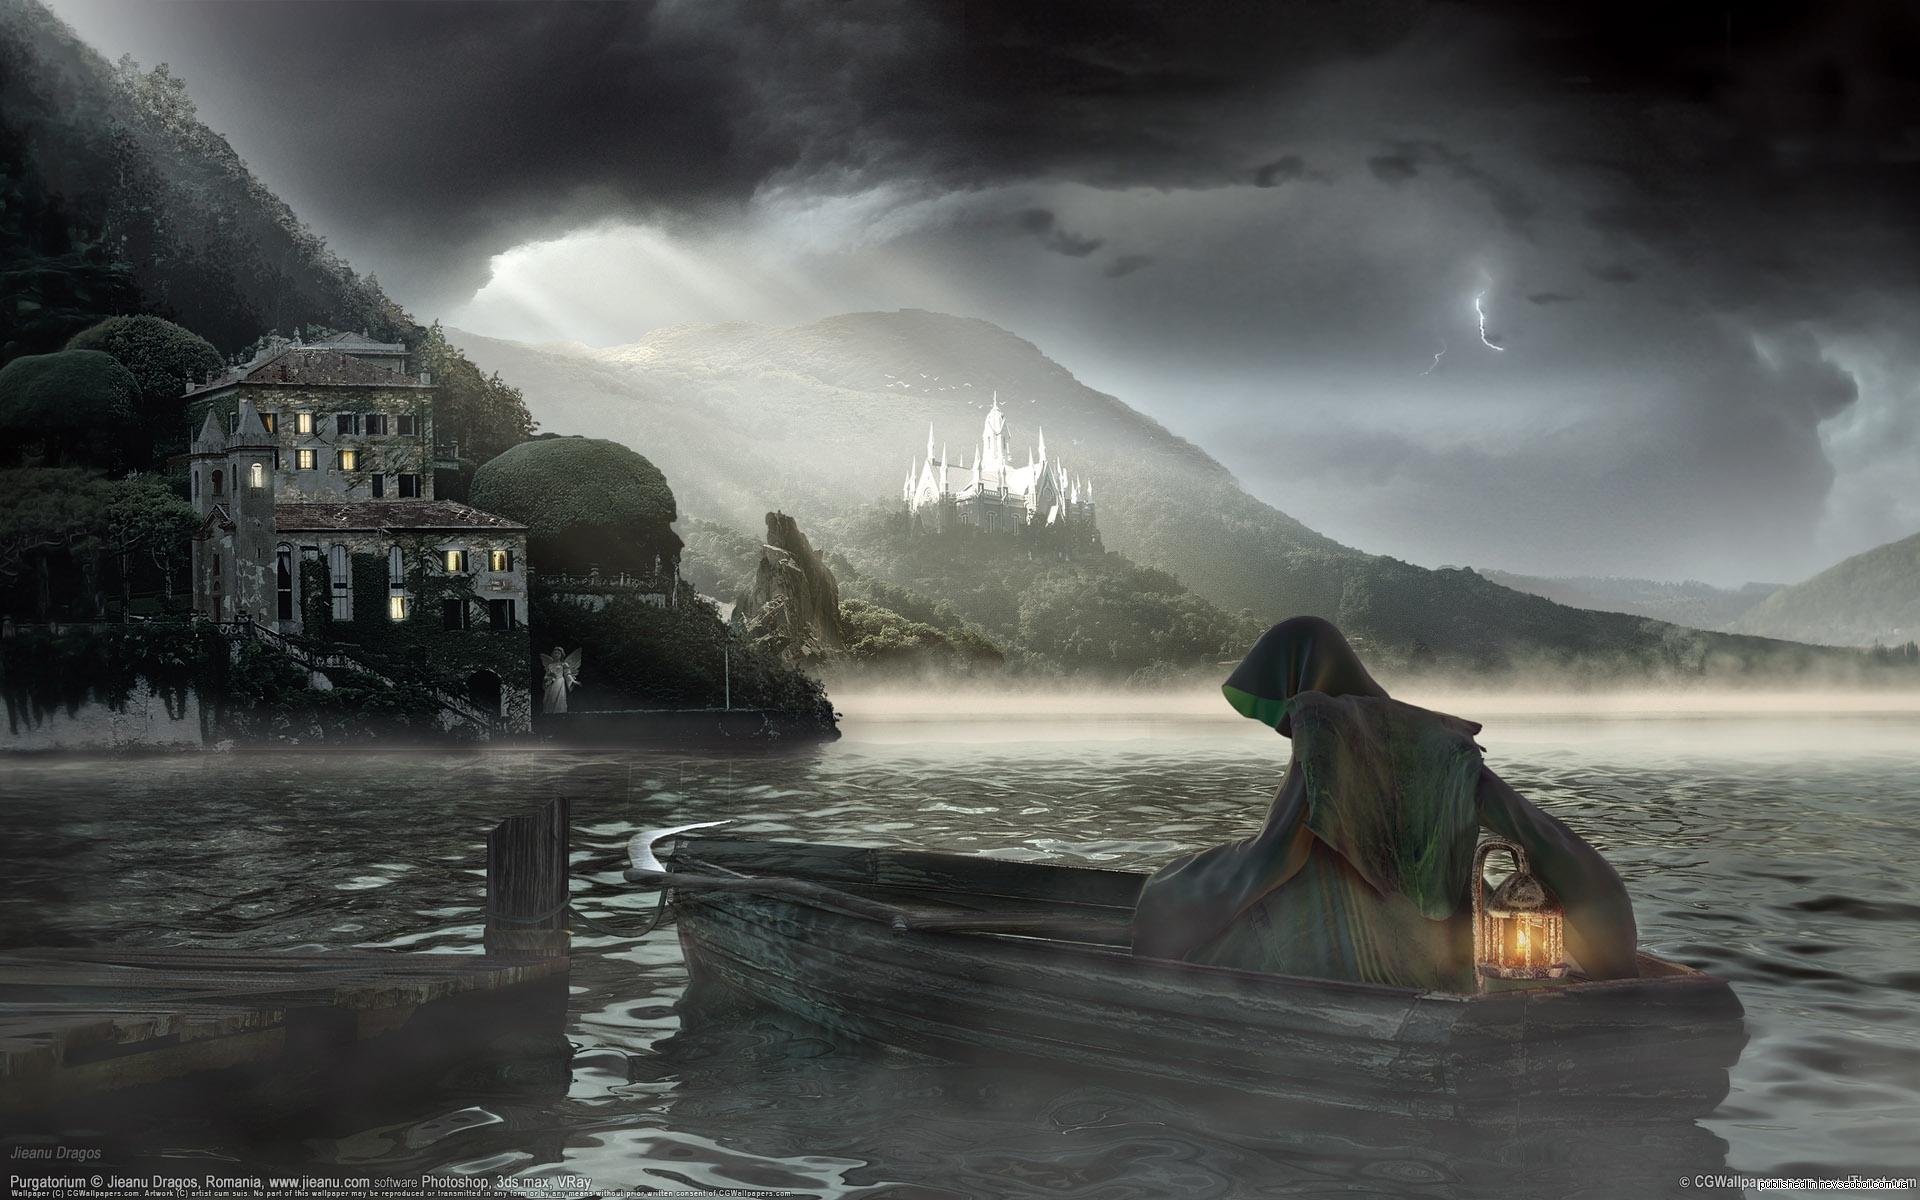 Image Detail For Dark Mysterious Hd Fantasy: Dark Horror Fantasy Gothic Castle Lamp Reaper Boat